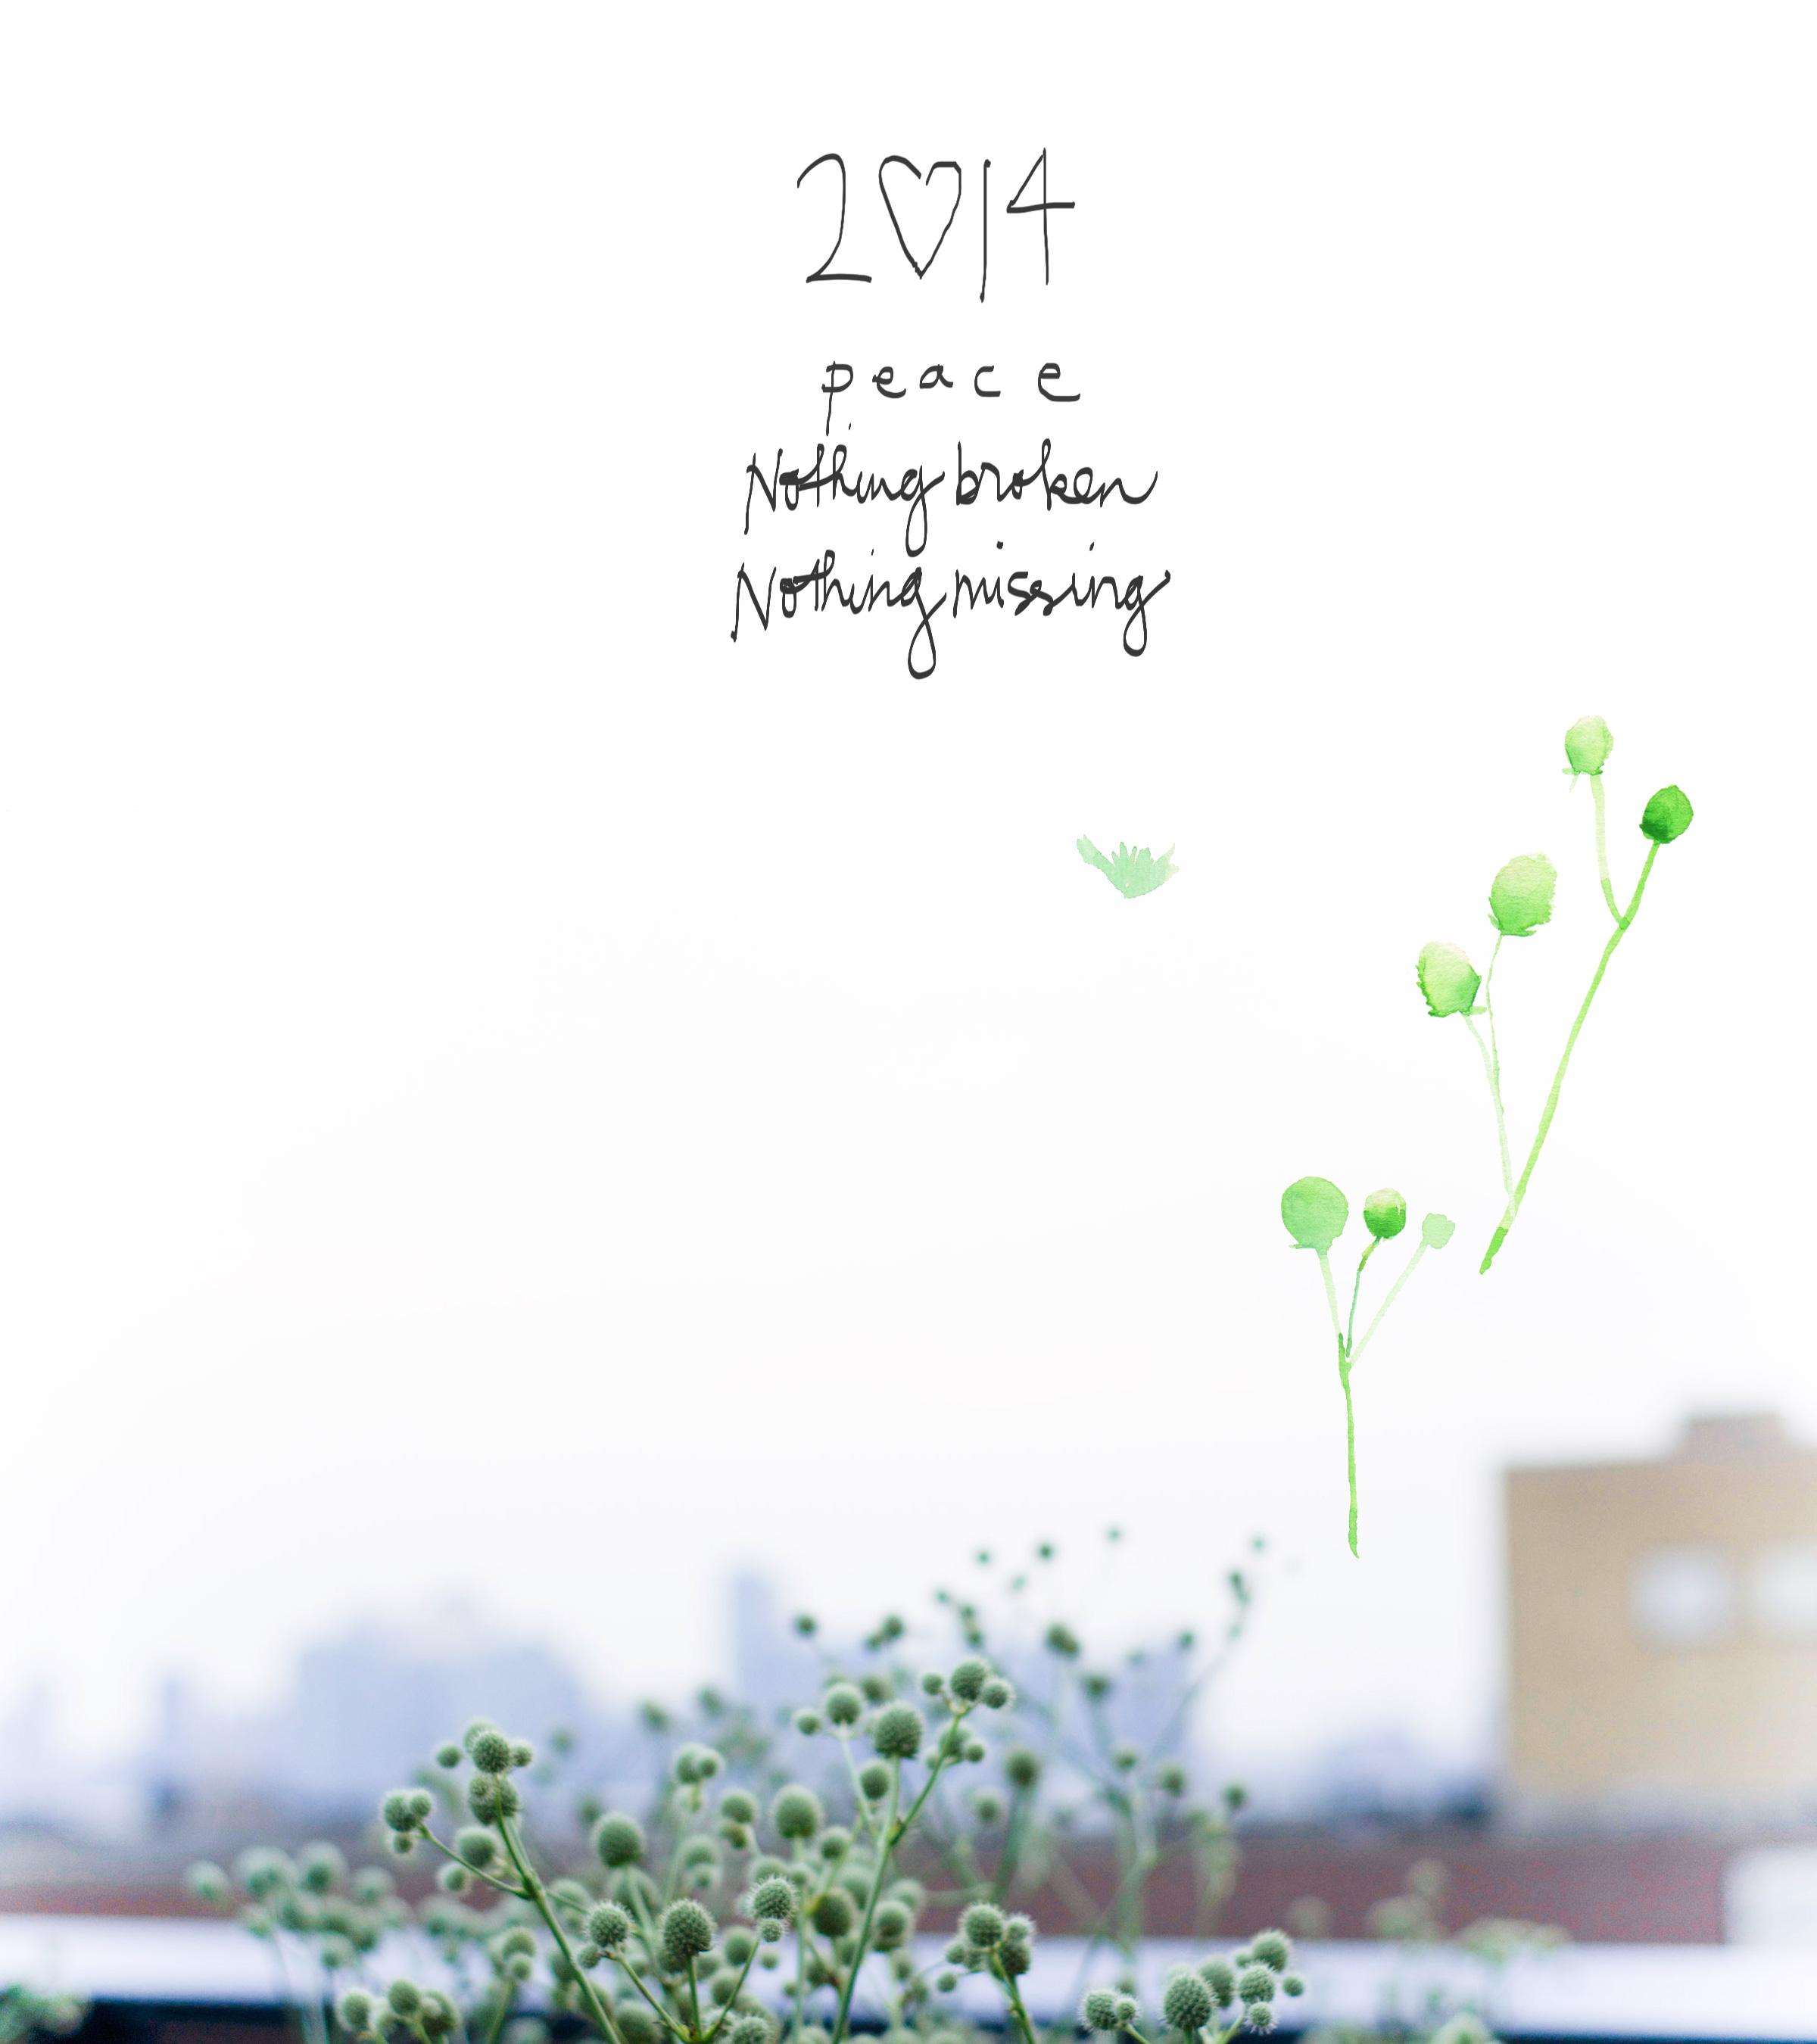 shl_2014-New-Year-Wish.jpg